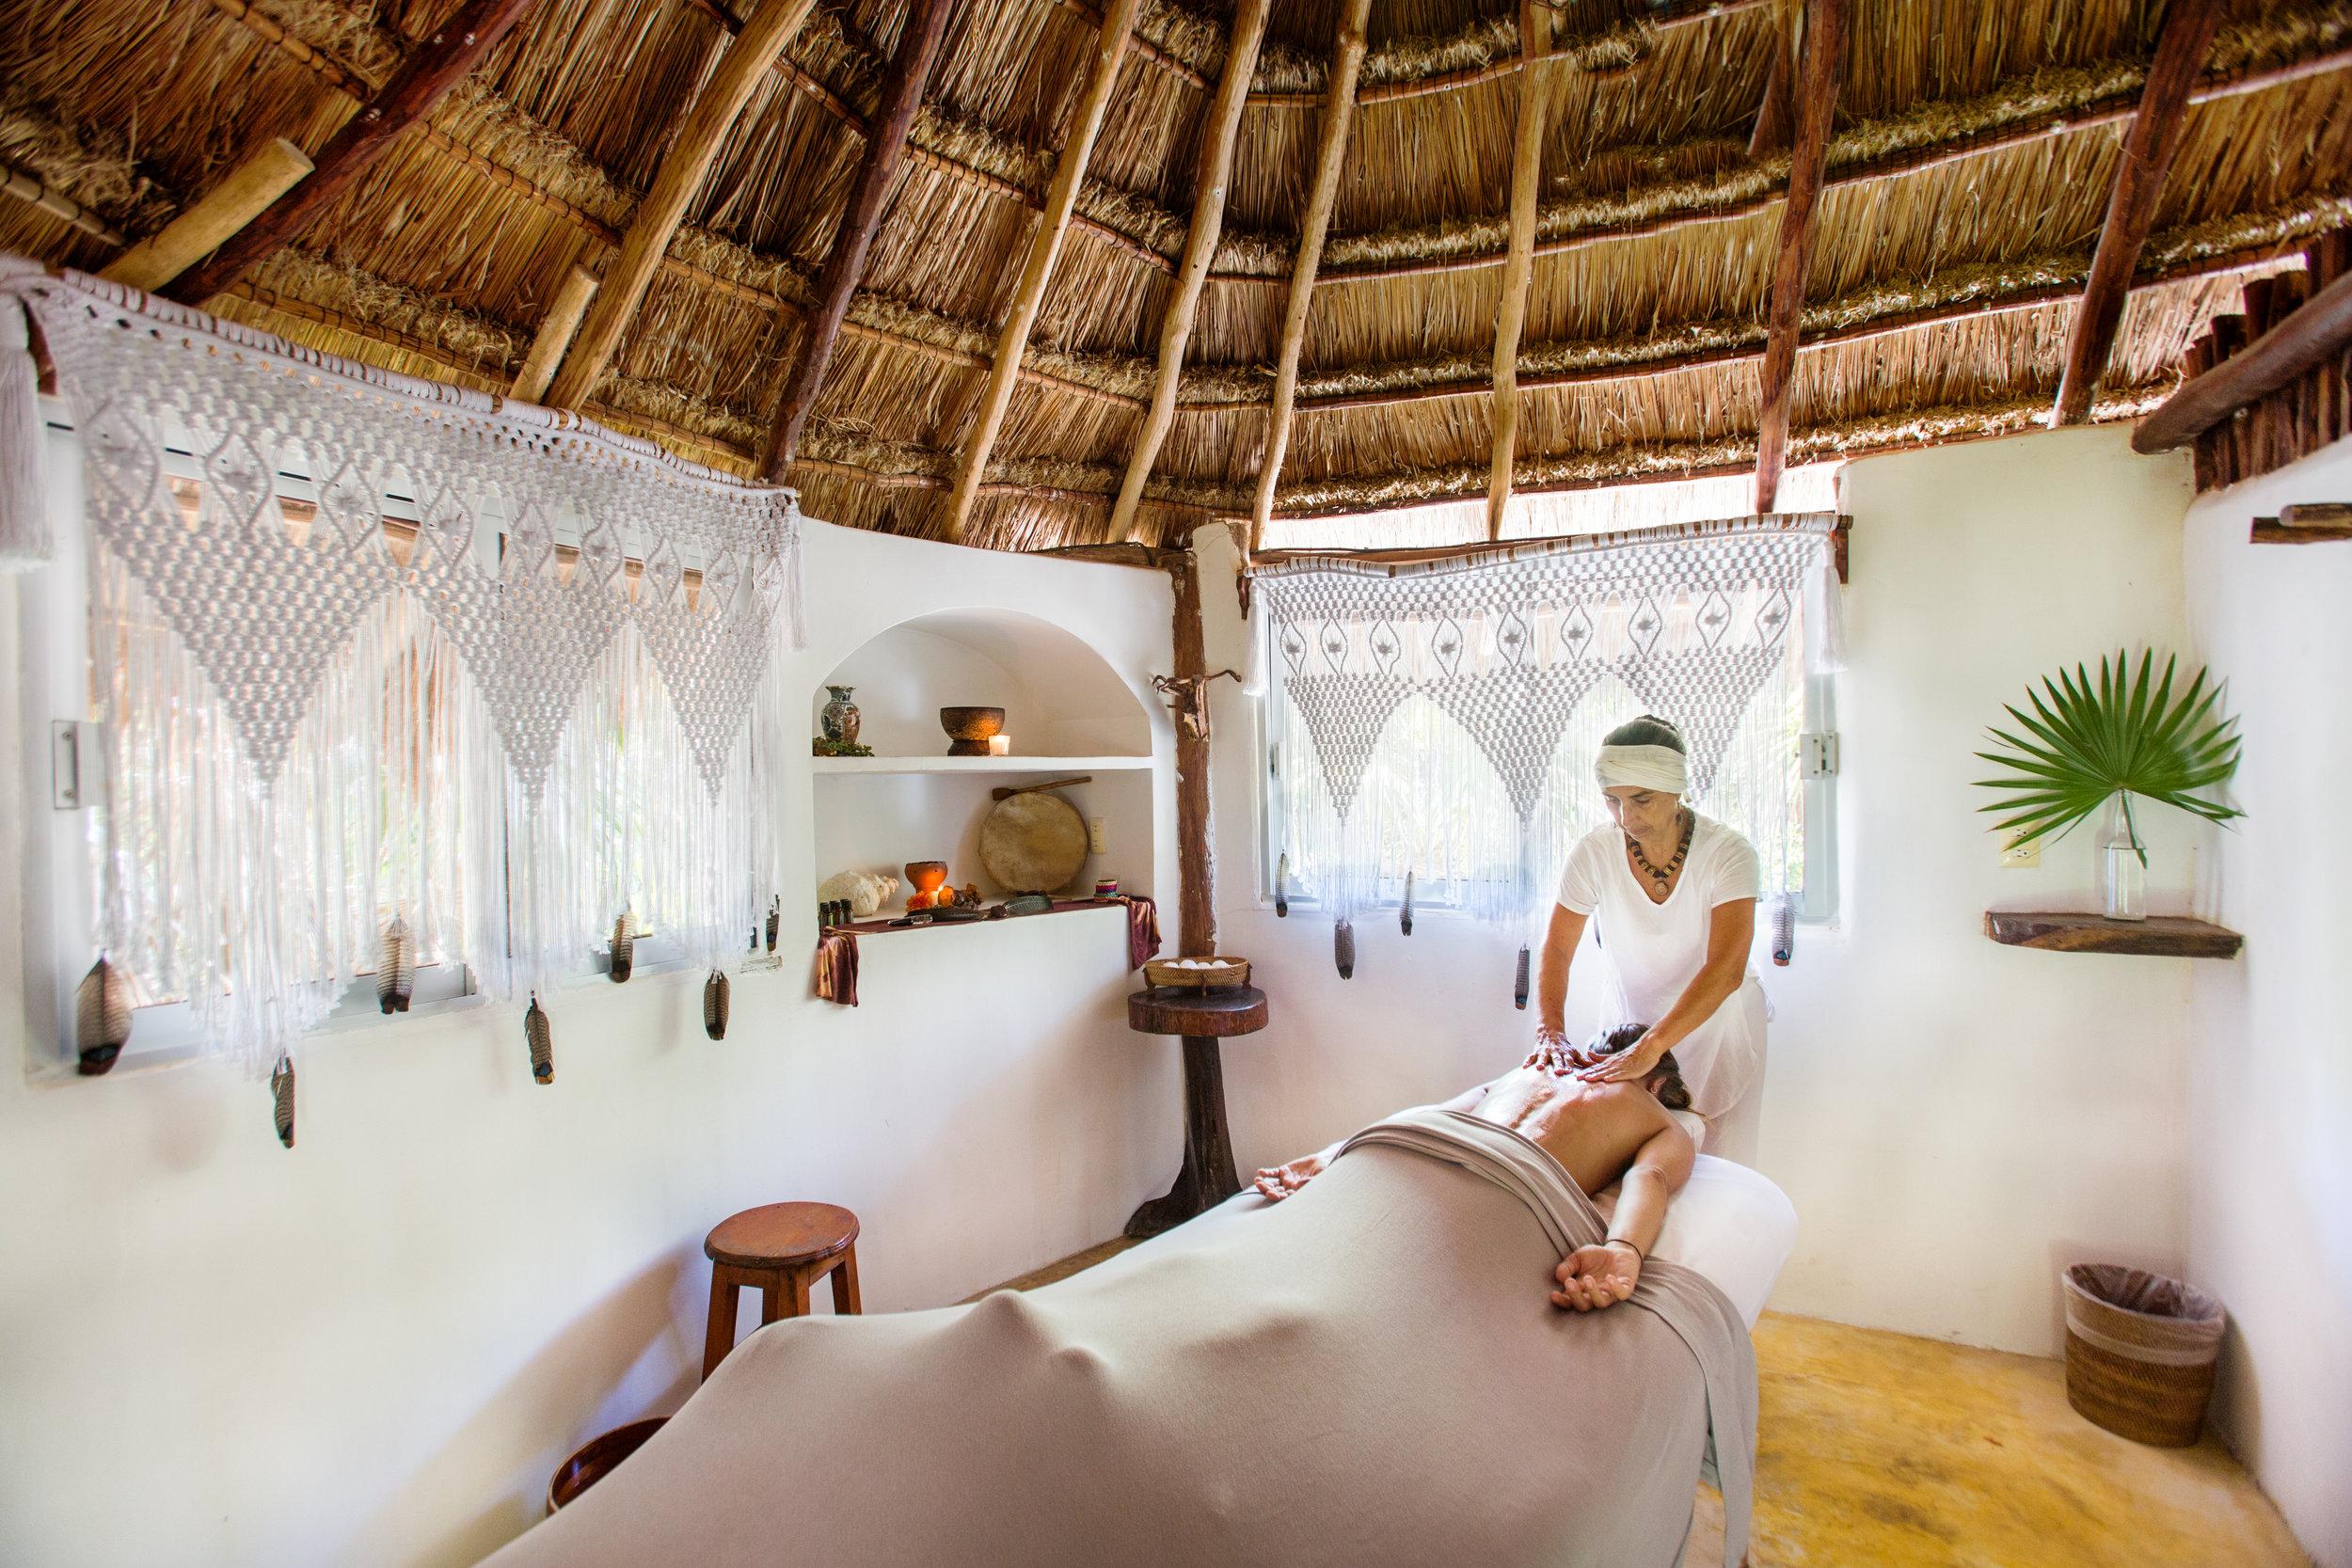 Spa Services - Deep Tissue or Swedish Massage 90 usd/55 minsMayan Healing Services 135 usd/85 minsReflexology or Facials 90 usd/55 minsTarot Card Readings 90 usd/55 mins